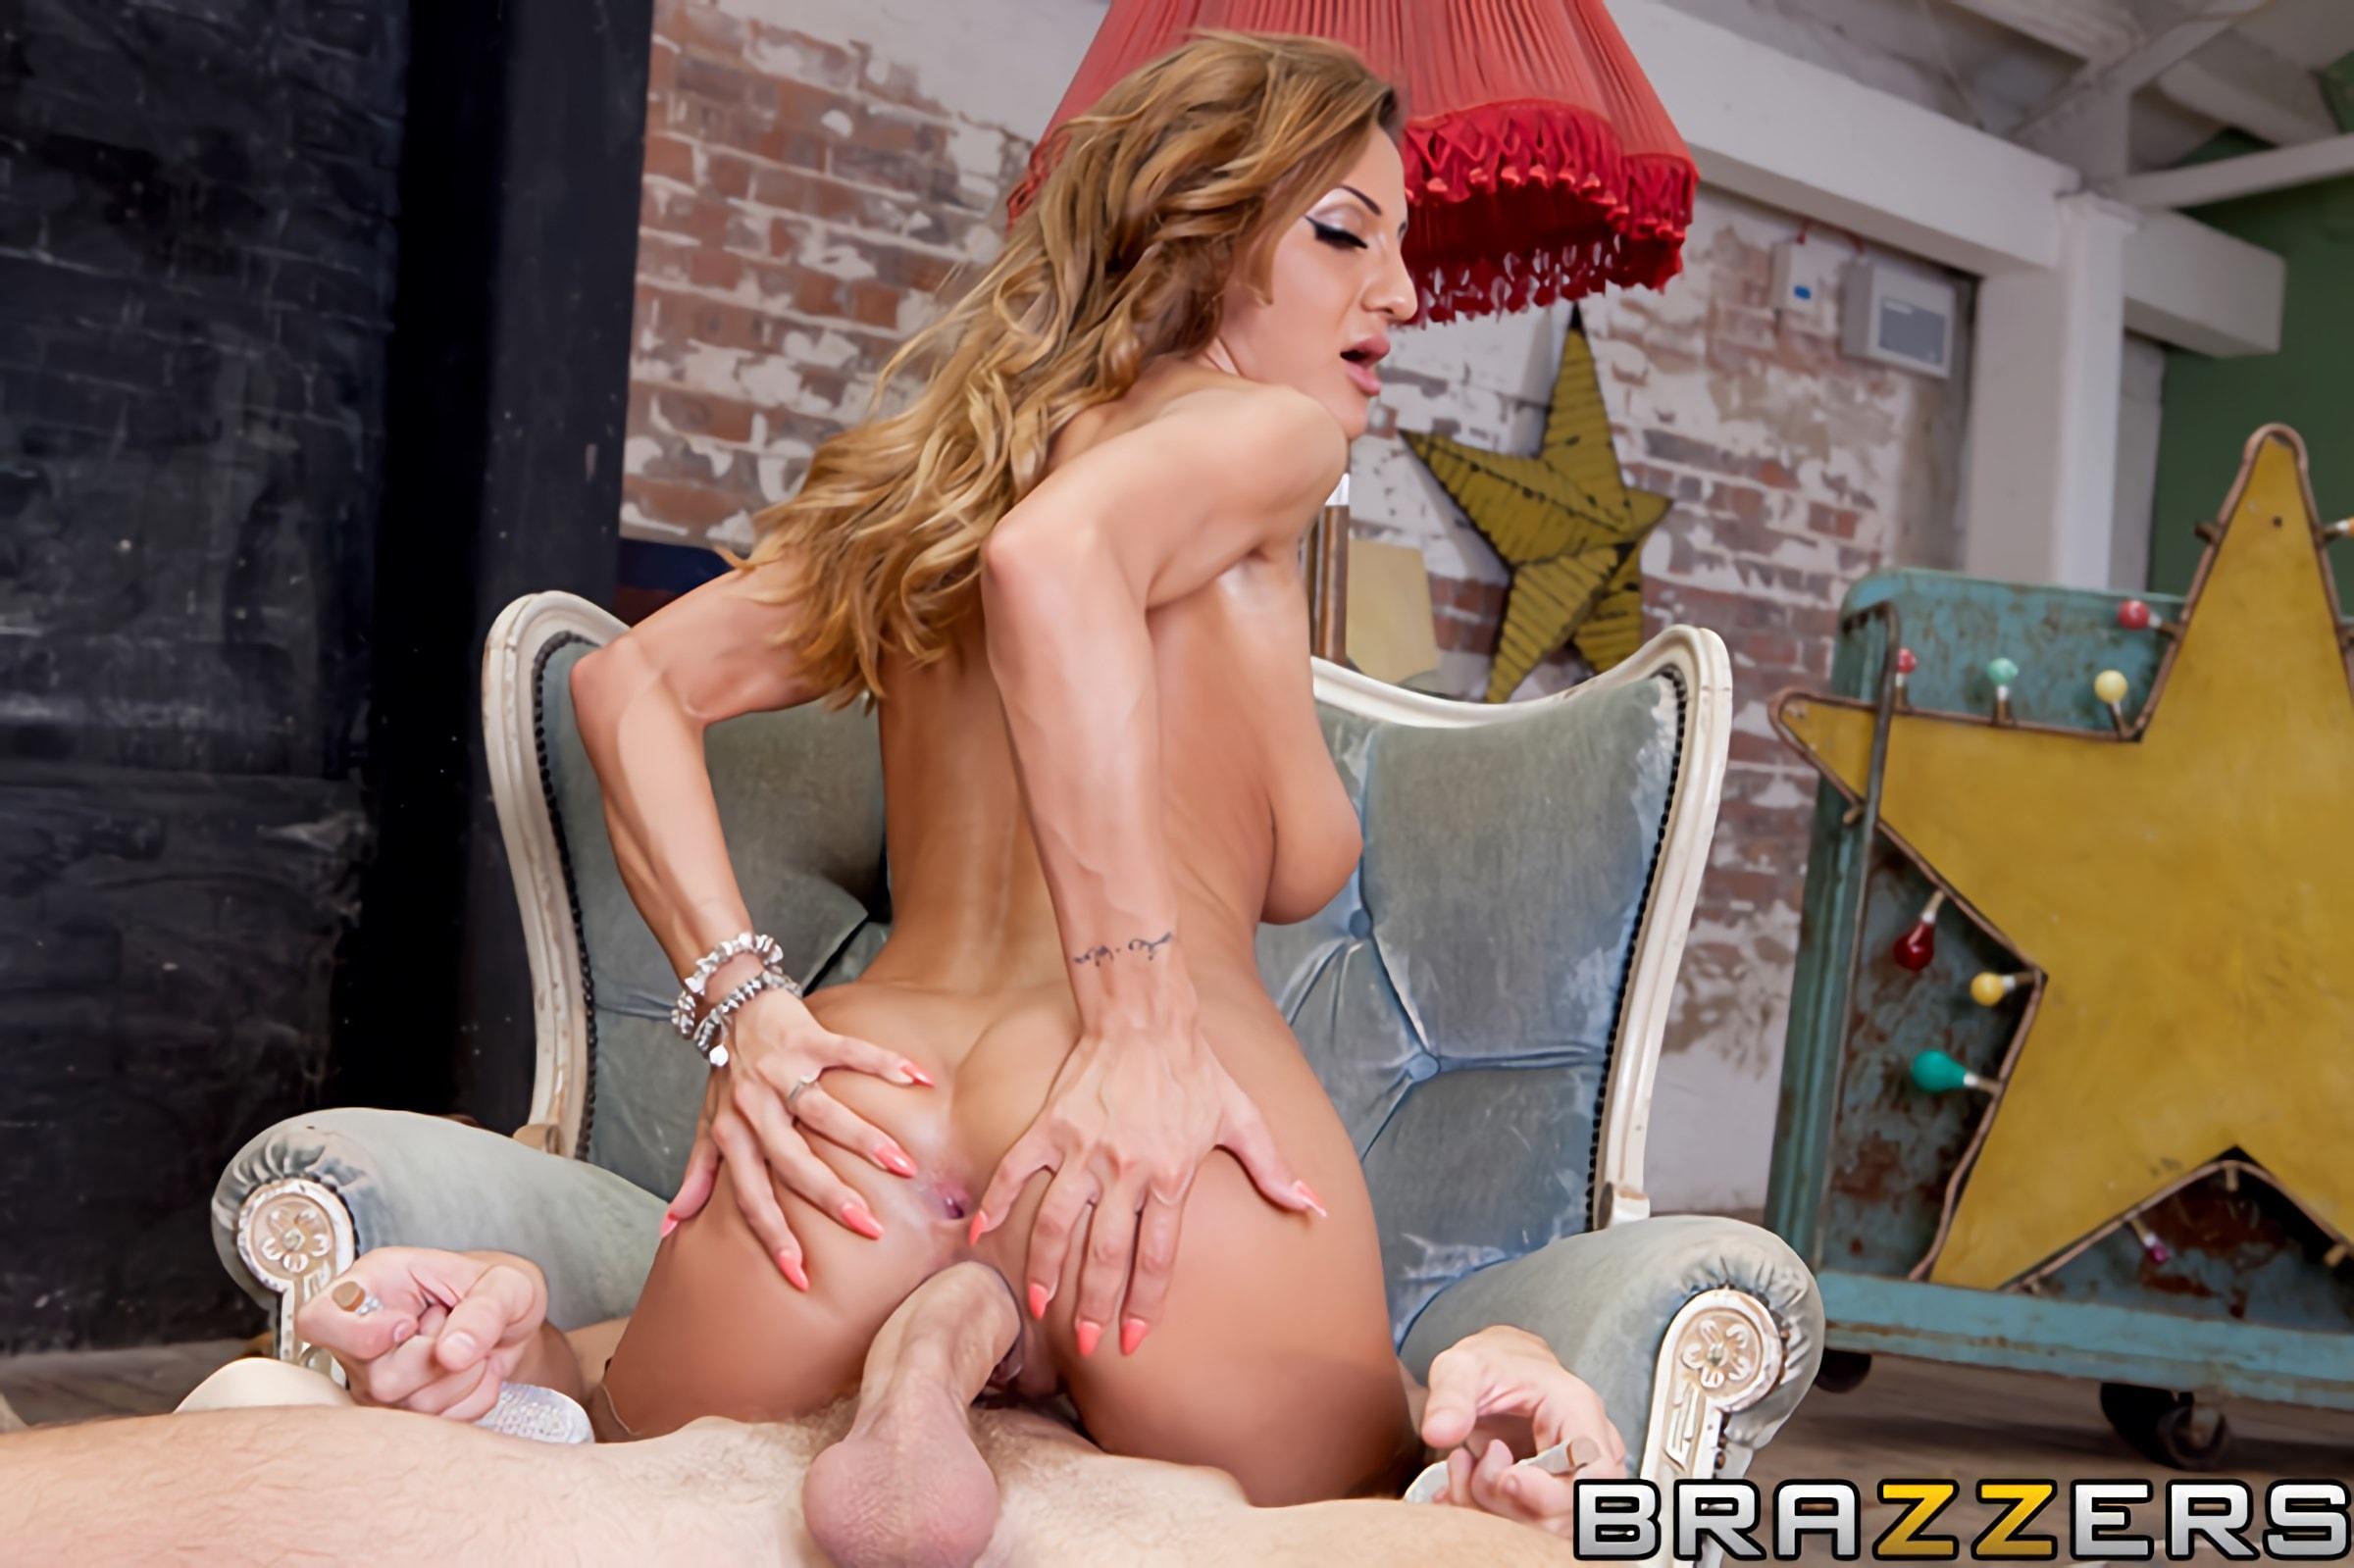 Sarah shevon lesbian anal_pic15402